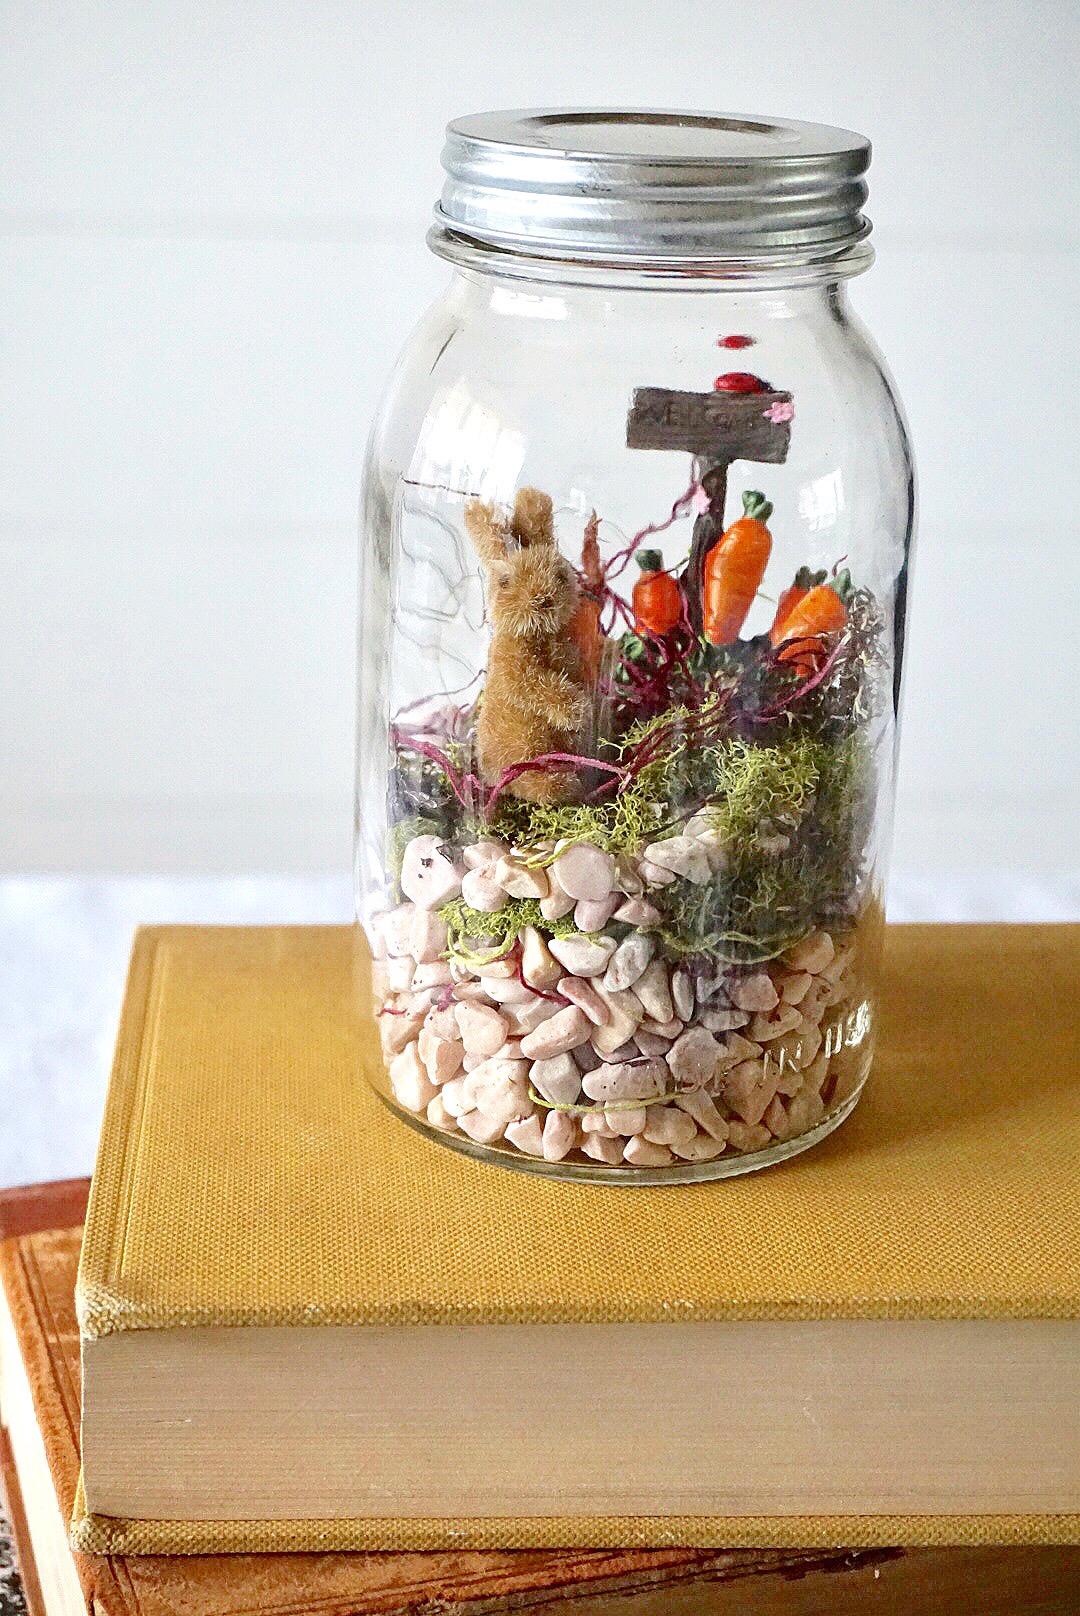 DIY Mason Jar Easter Fairy Garden Terrarium made with bunny figurines and moss.